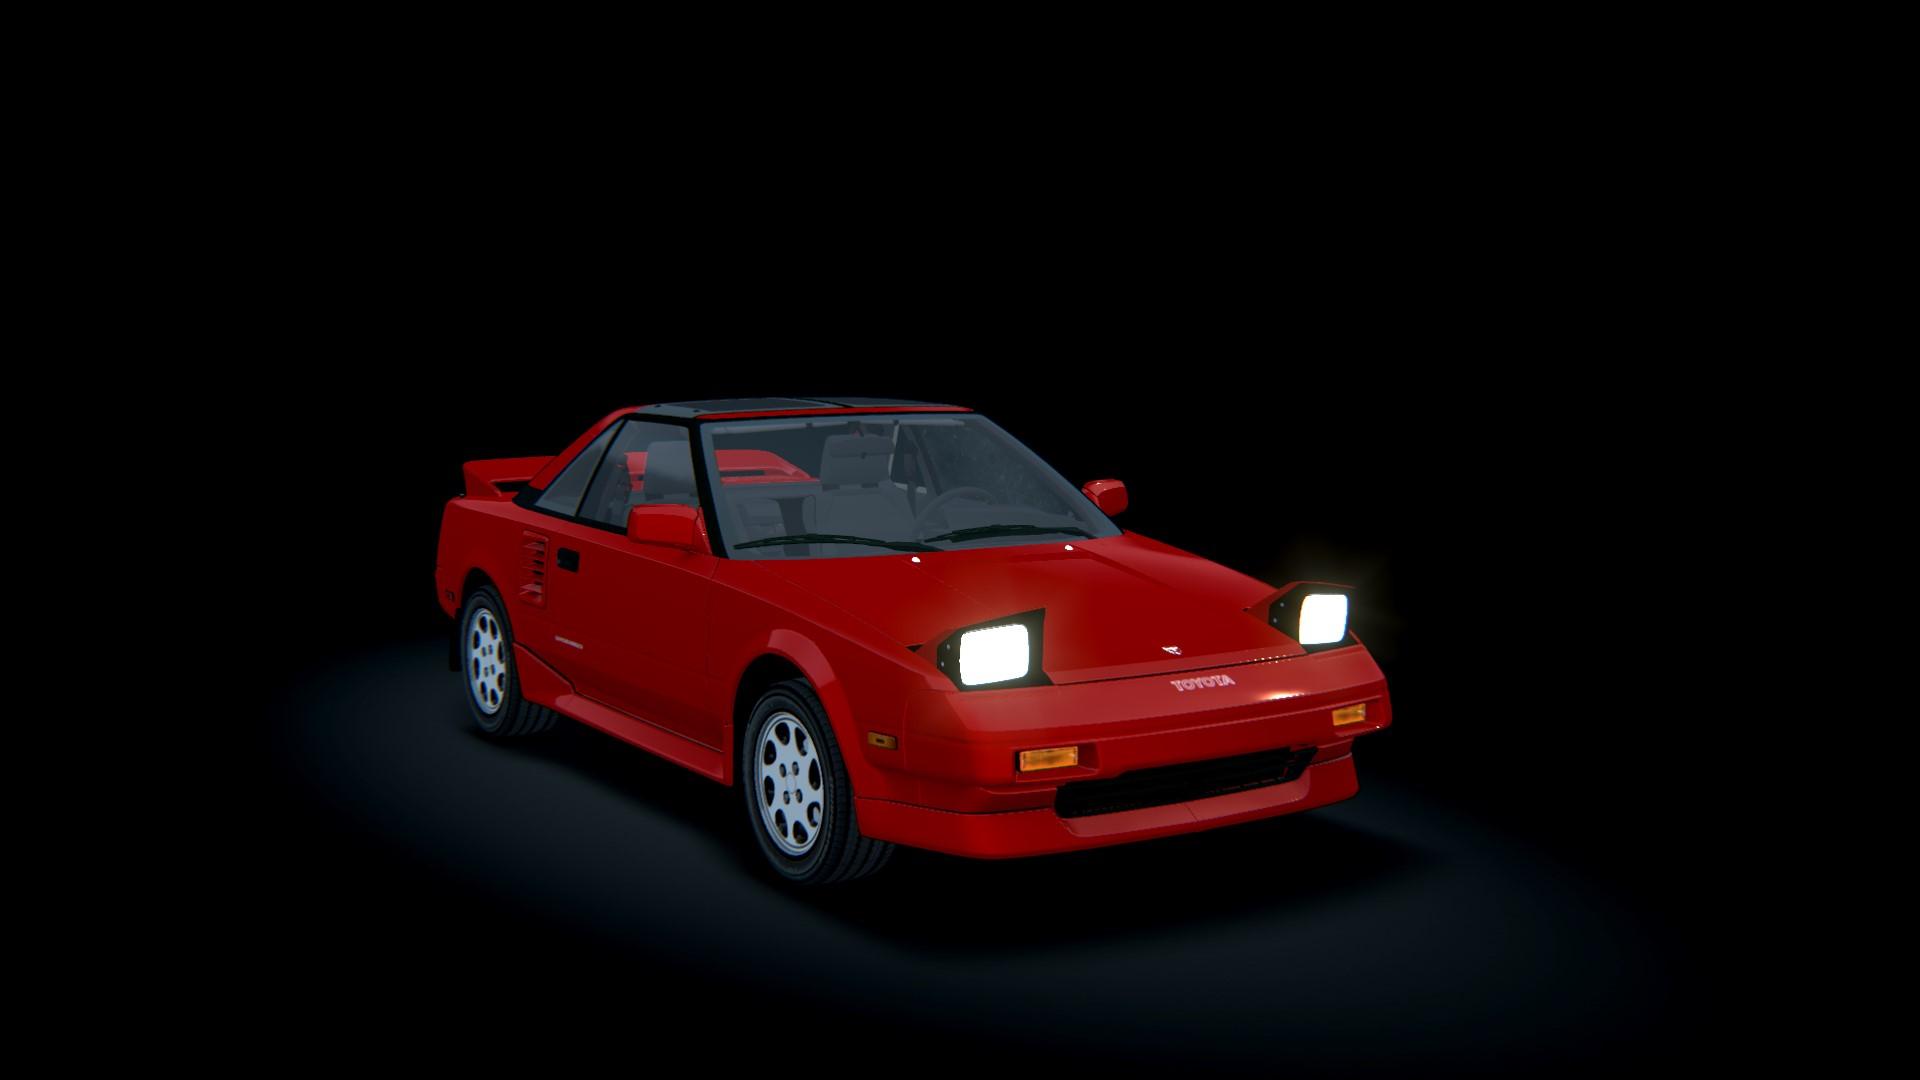 Toyota Of Orange >> MR2 AW11 - Toyota - Car Detail - Assetto Corsa Database